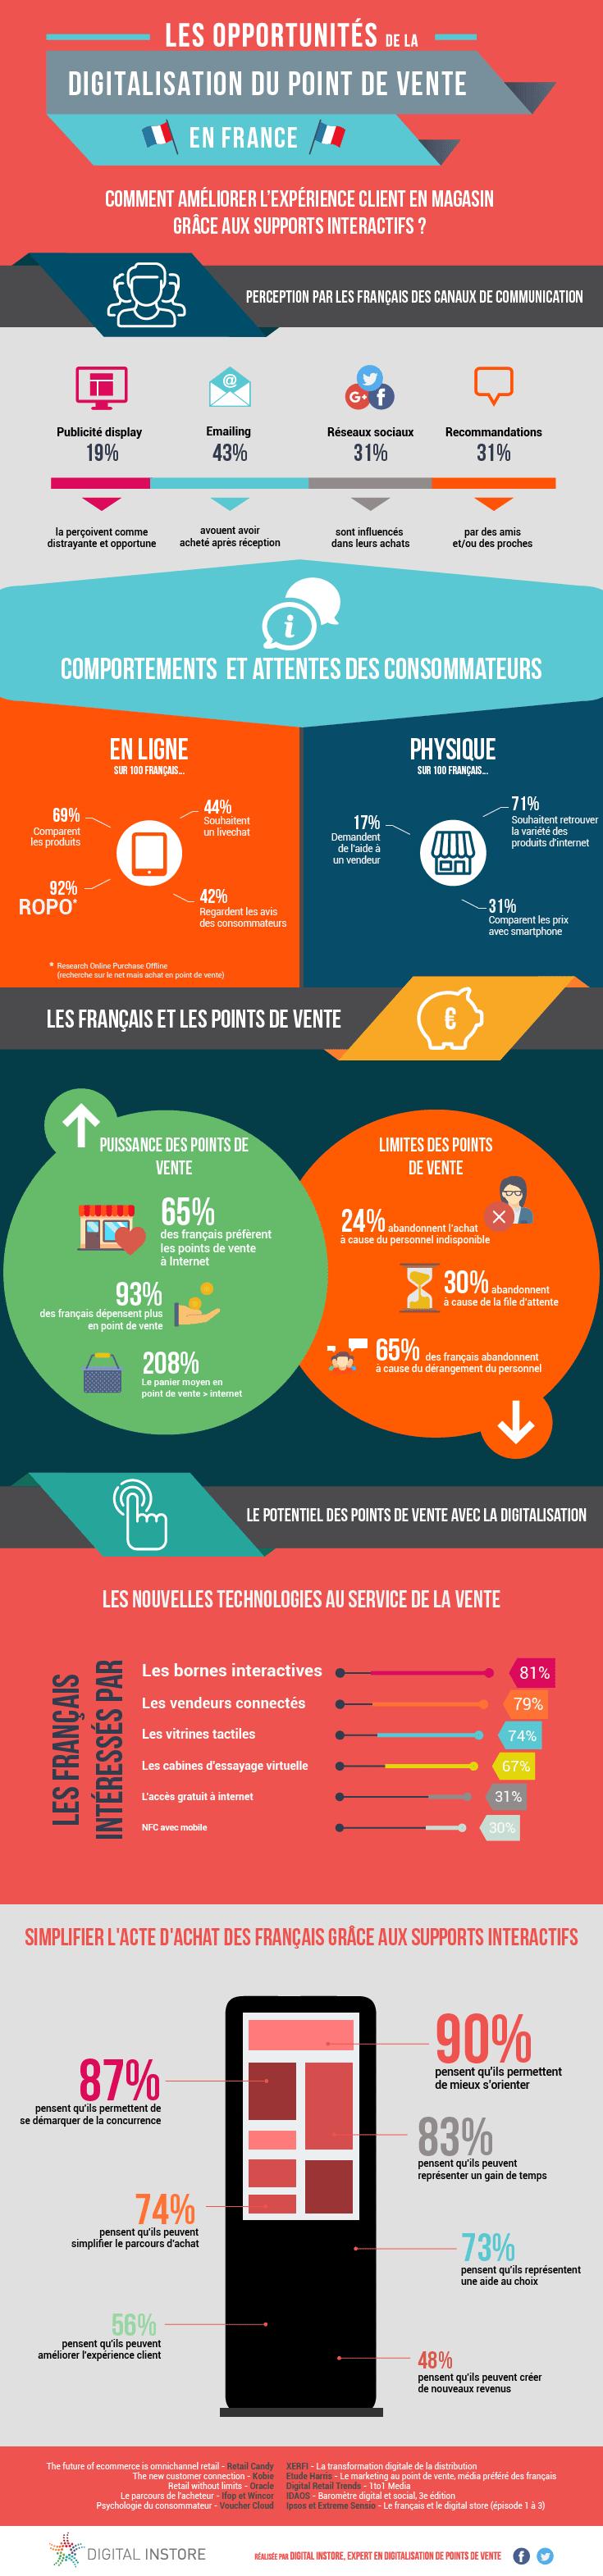 infographie-digitalisation-points-de-vente-en-france